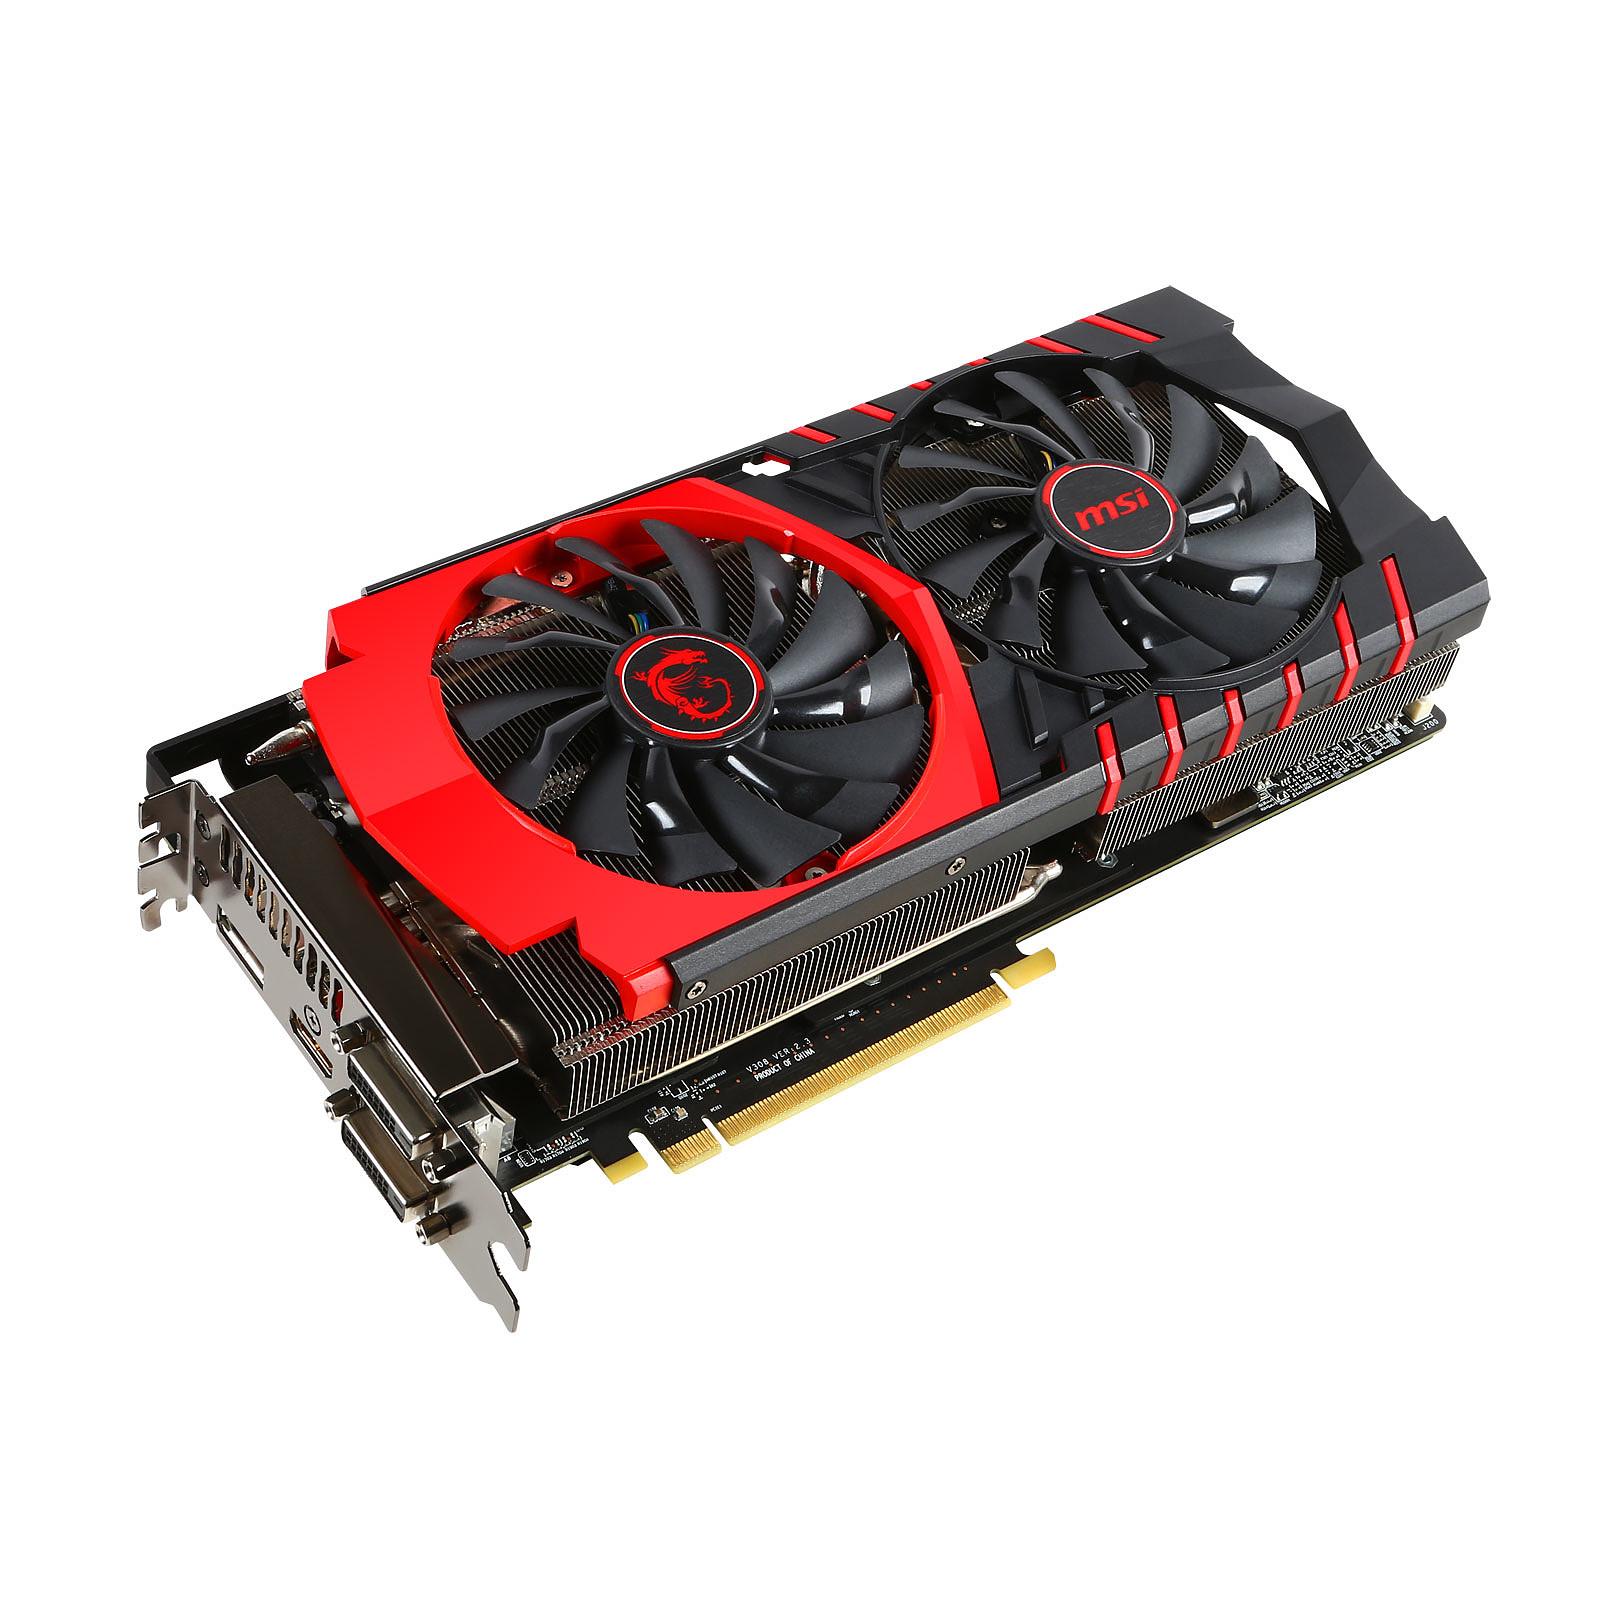 MSI Radeon R9 390X GAMING 8G